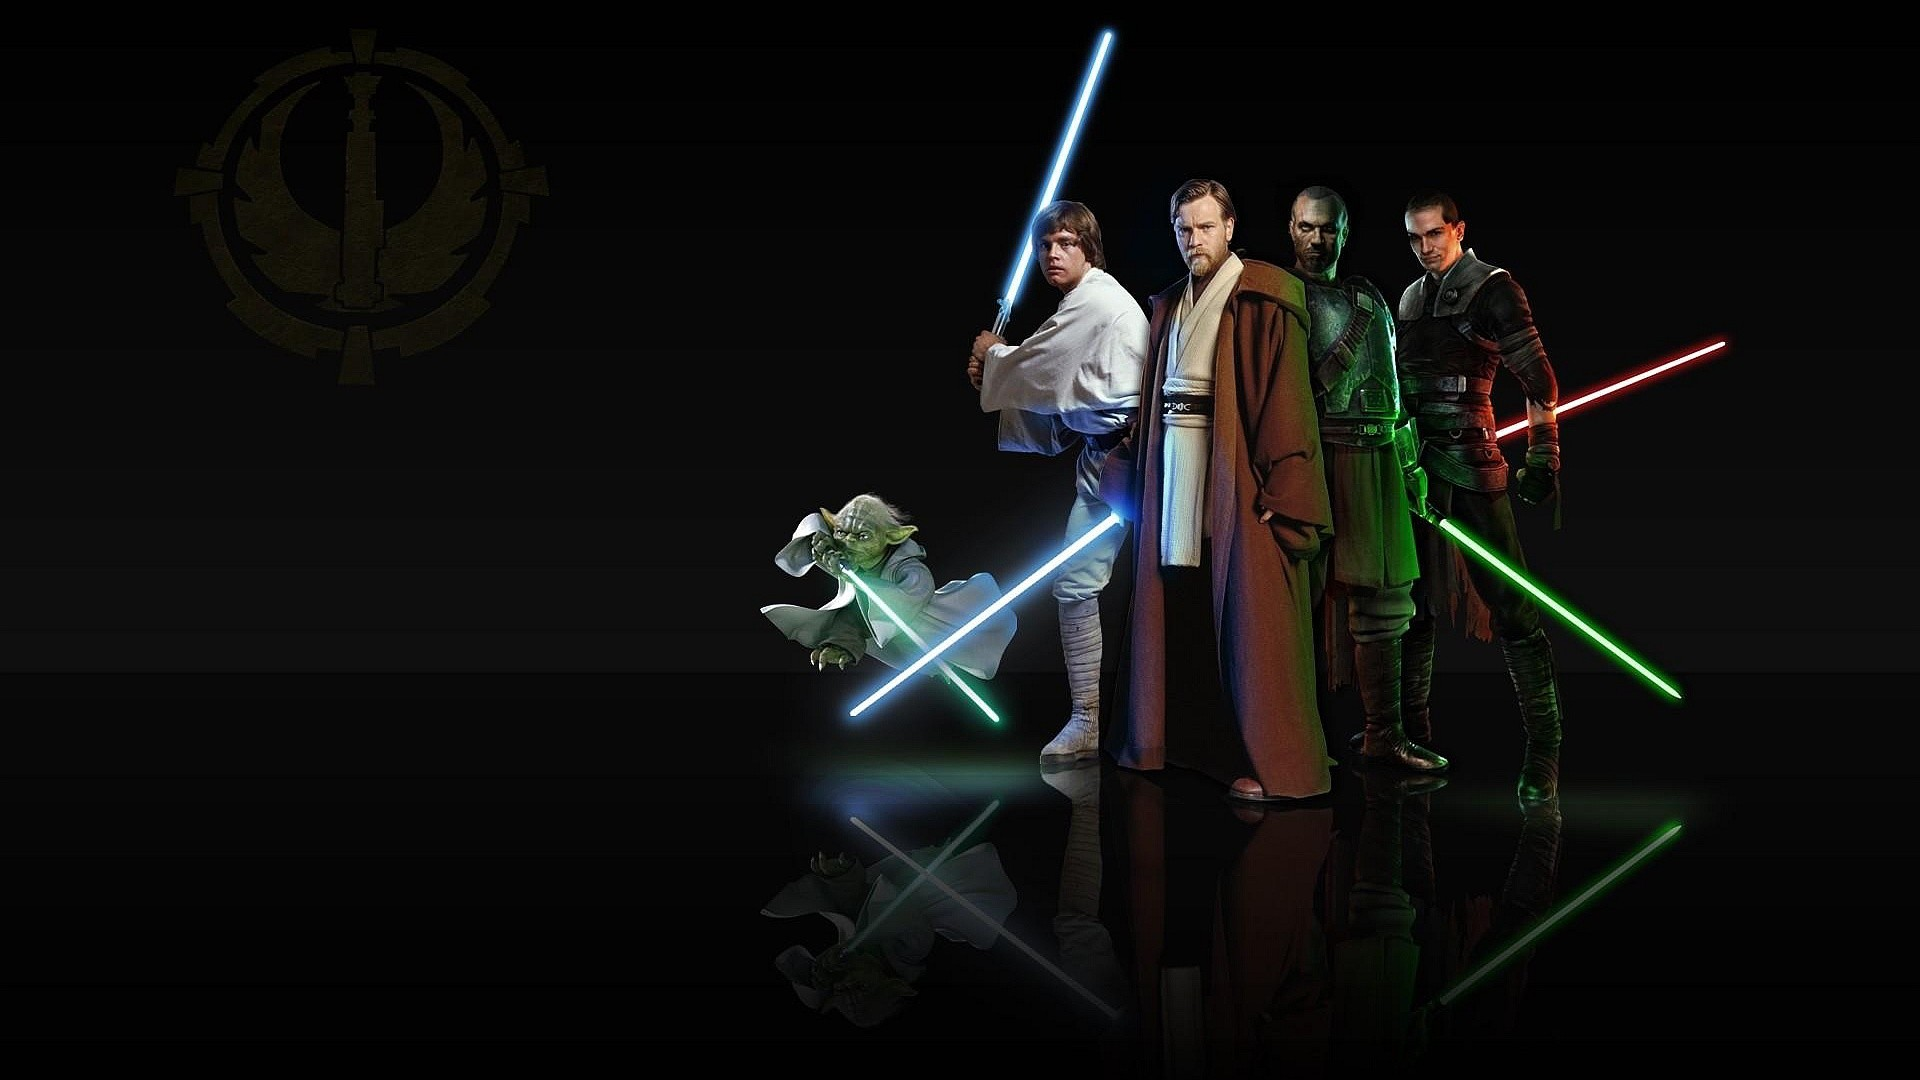 Star Wars Jedi Wallpapers Background As Wallpaper HD